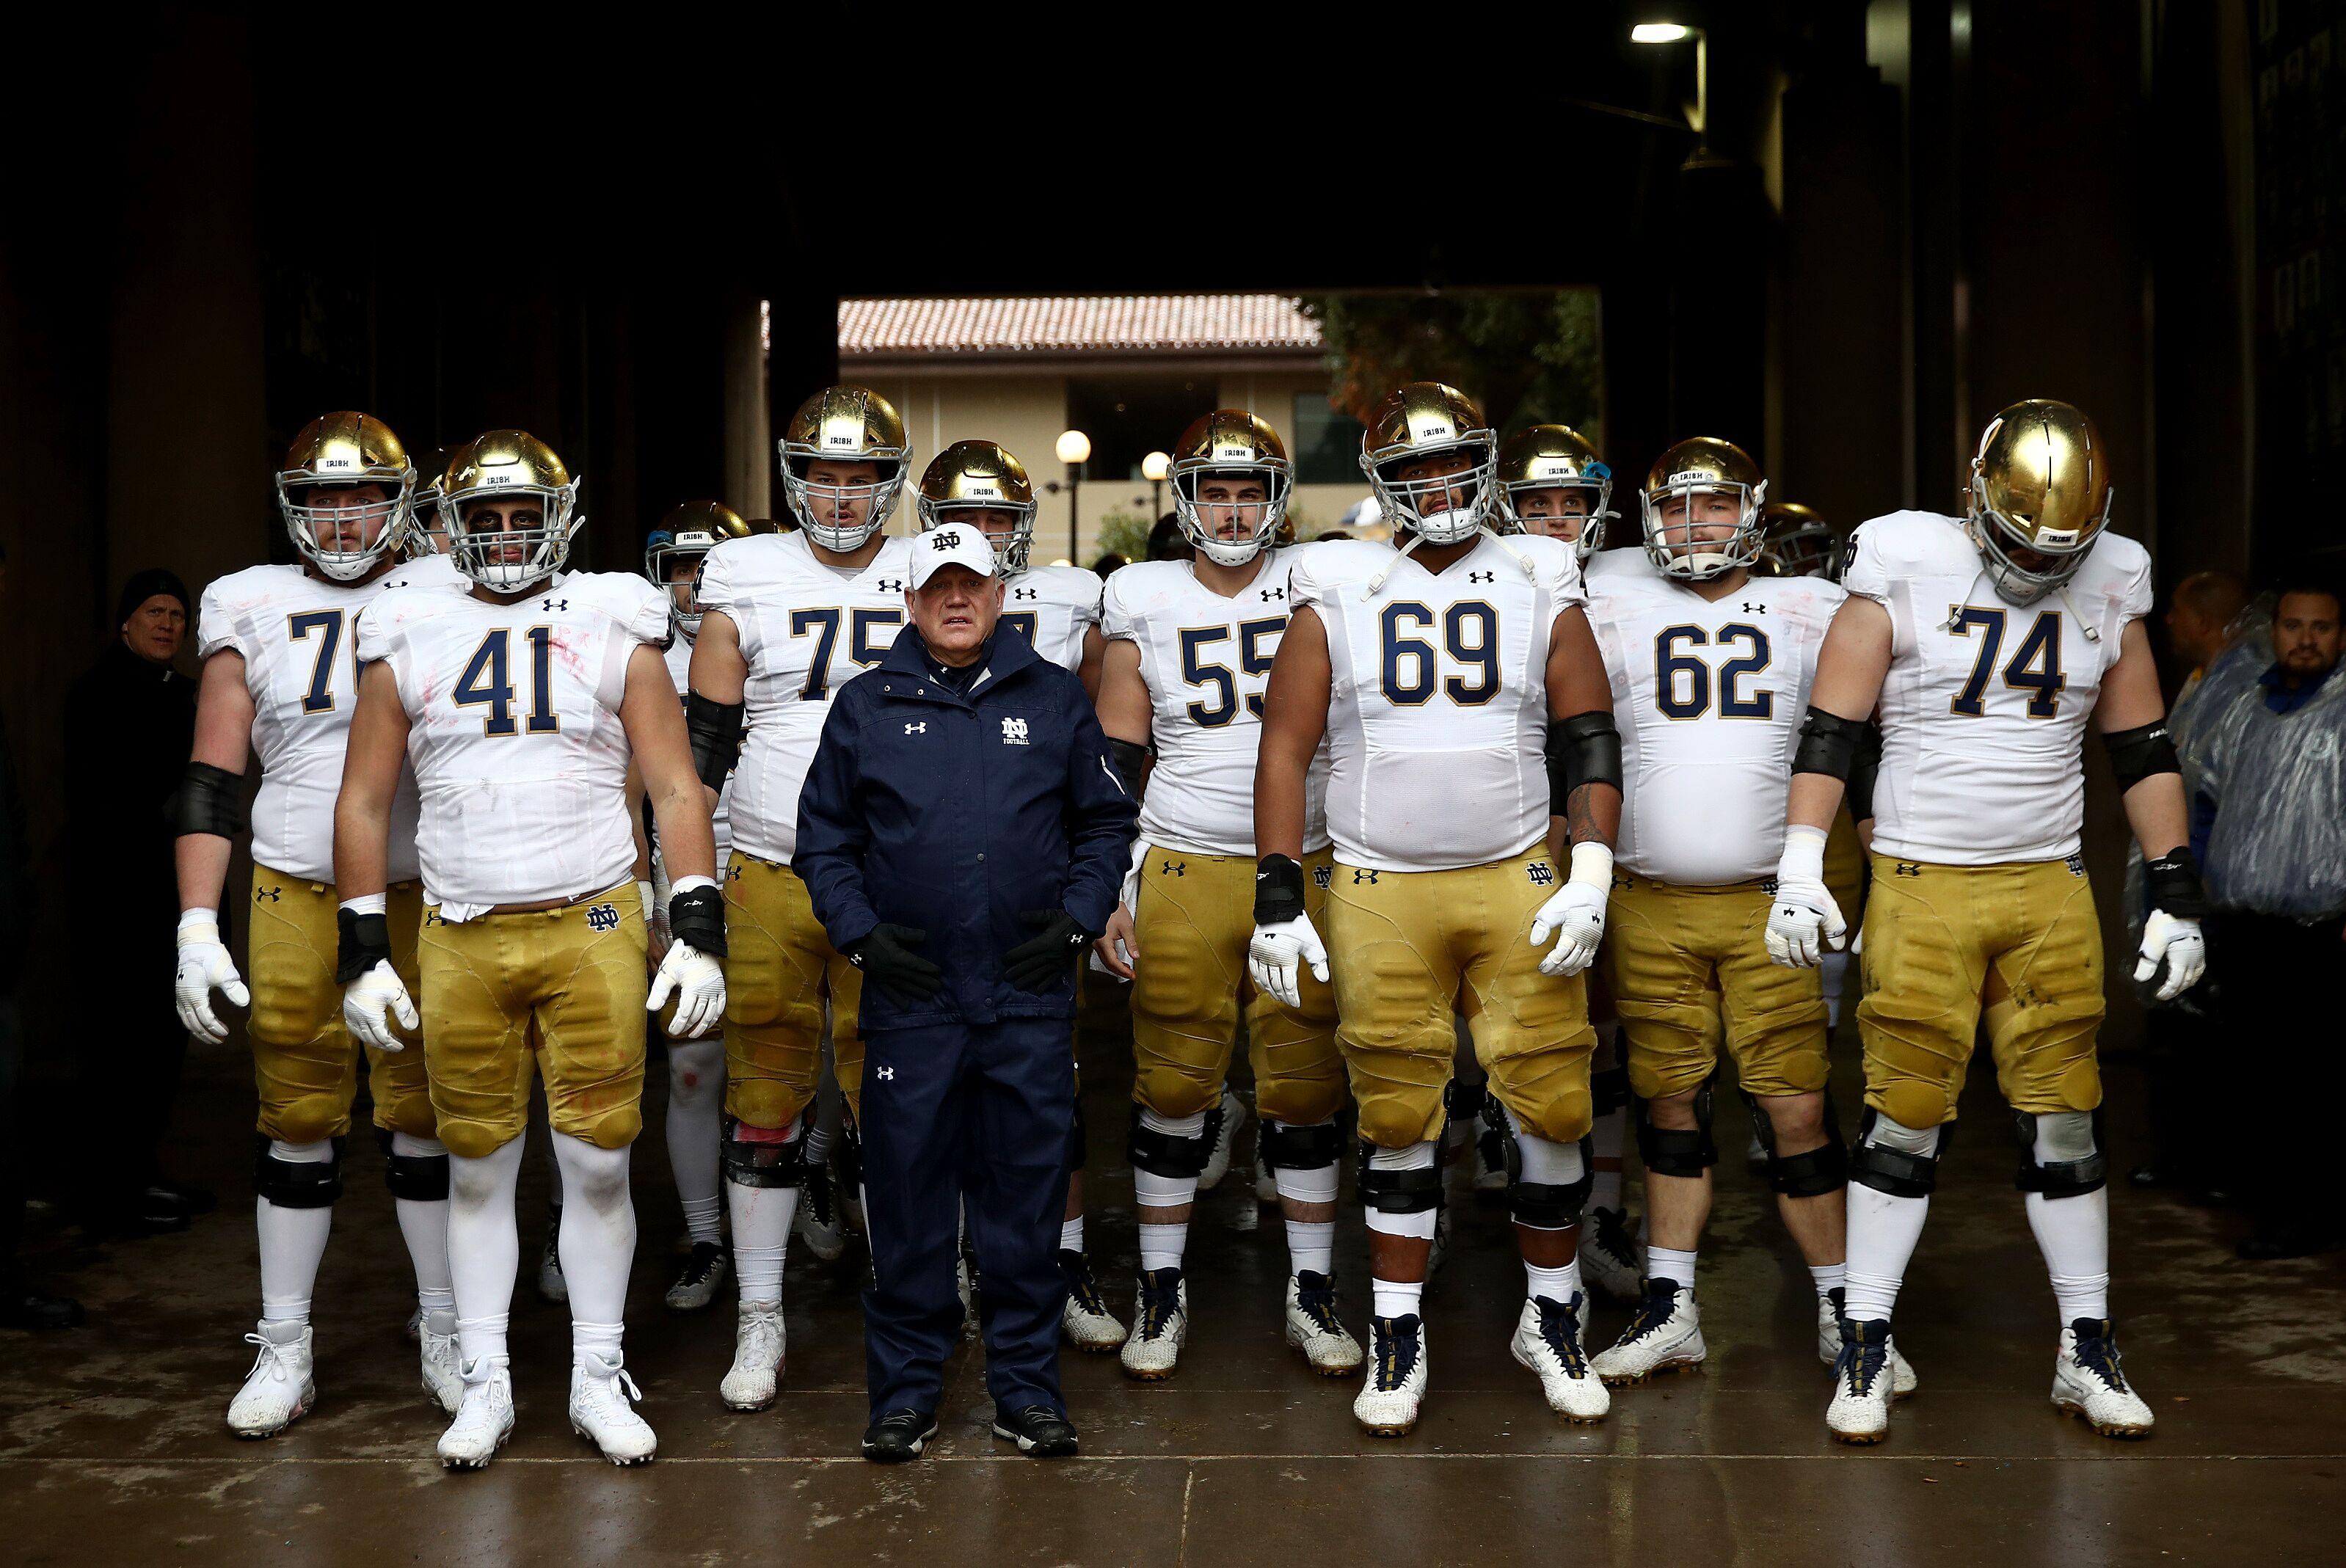 Notre Dame Football: Was bias a factor in final Irish ranking?